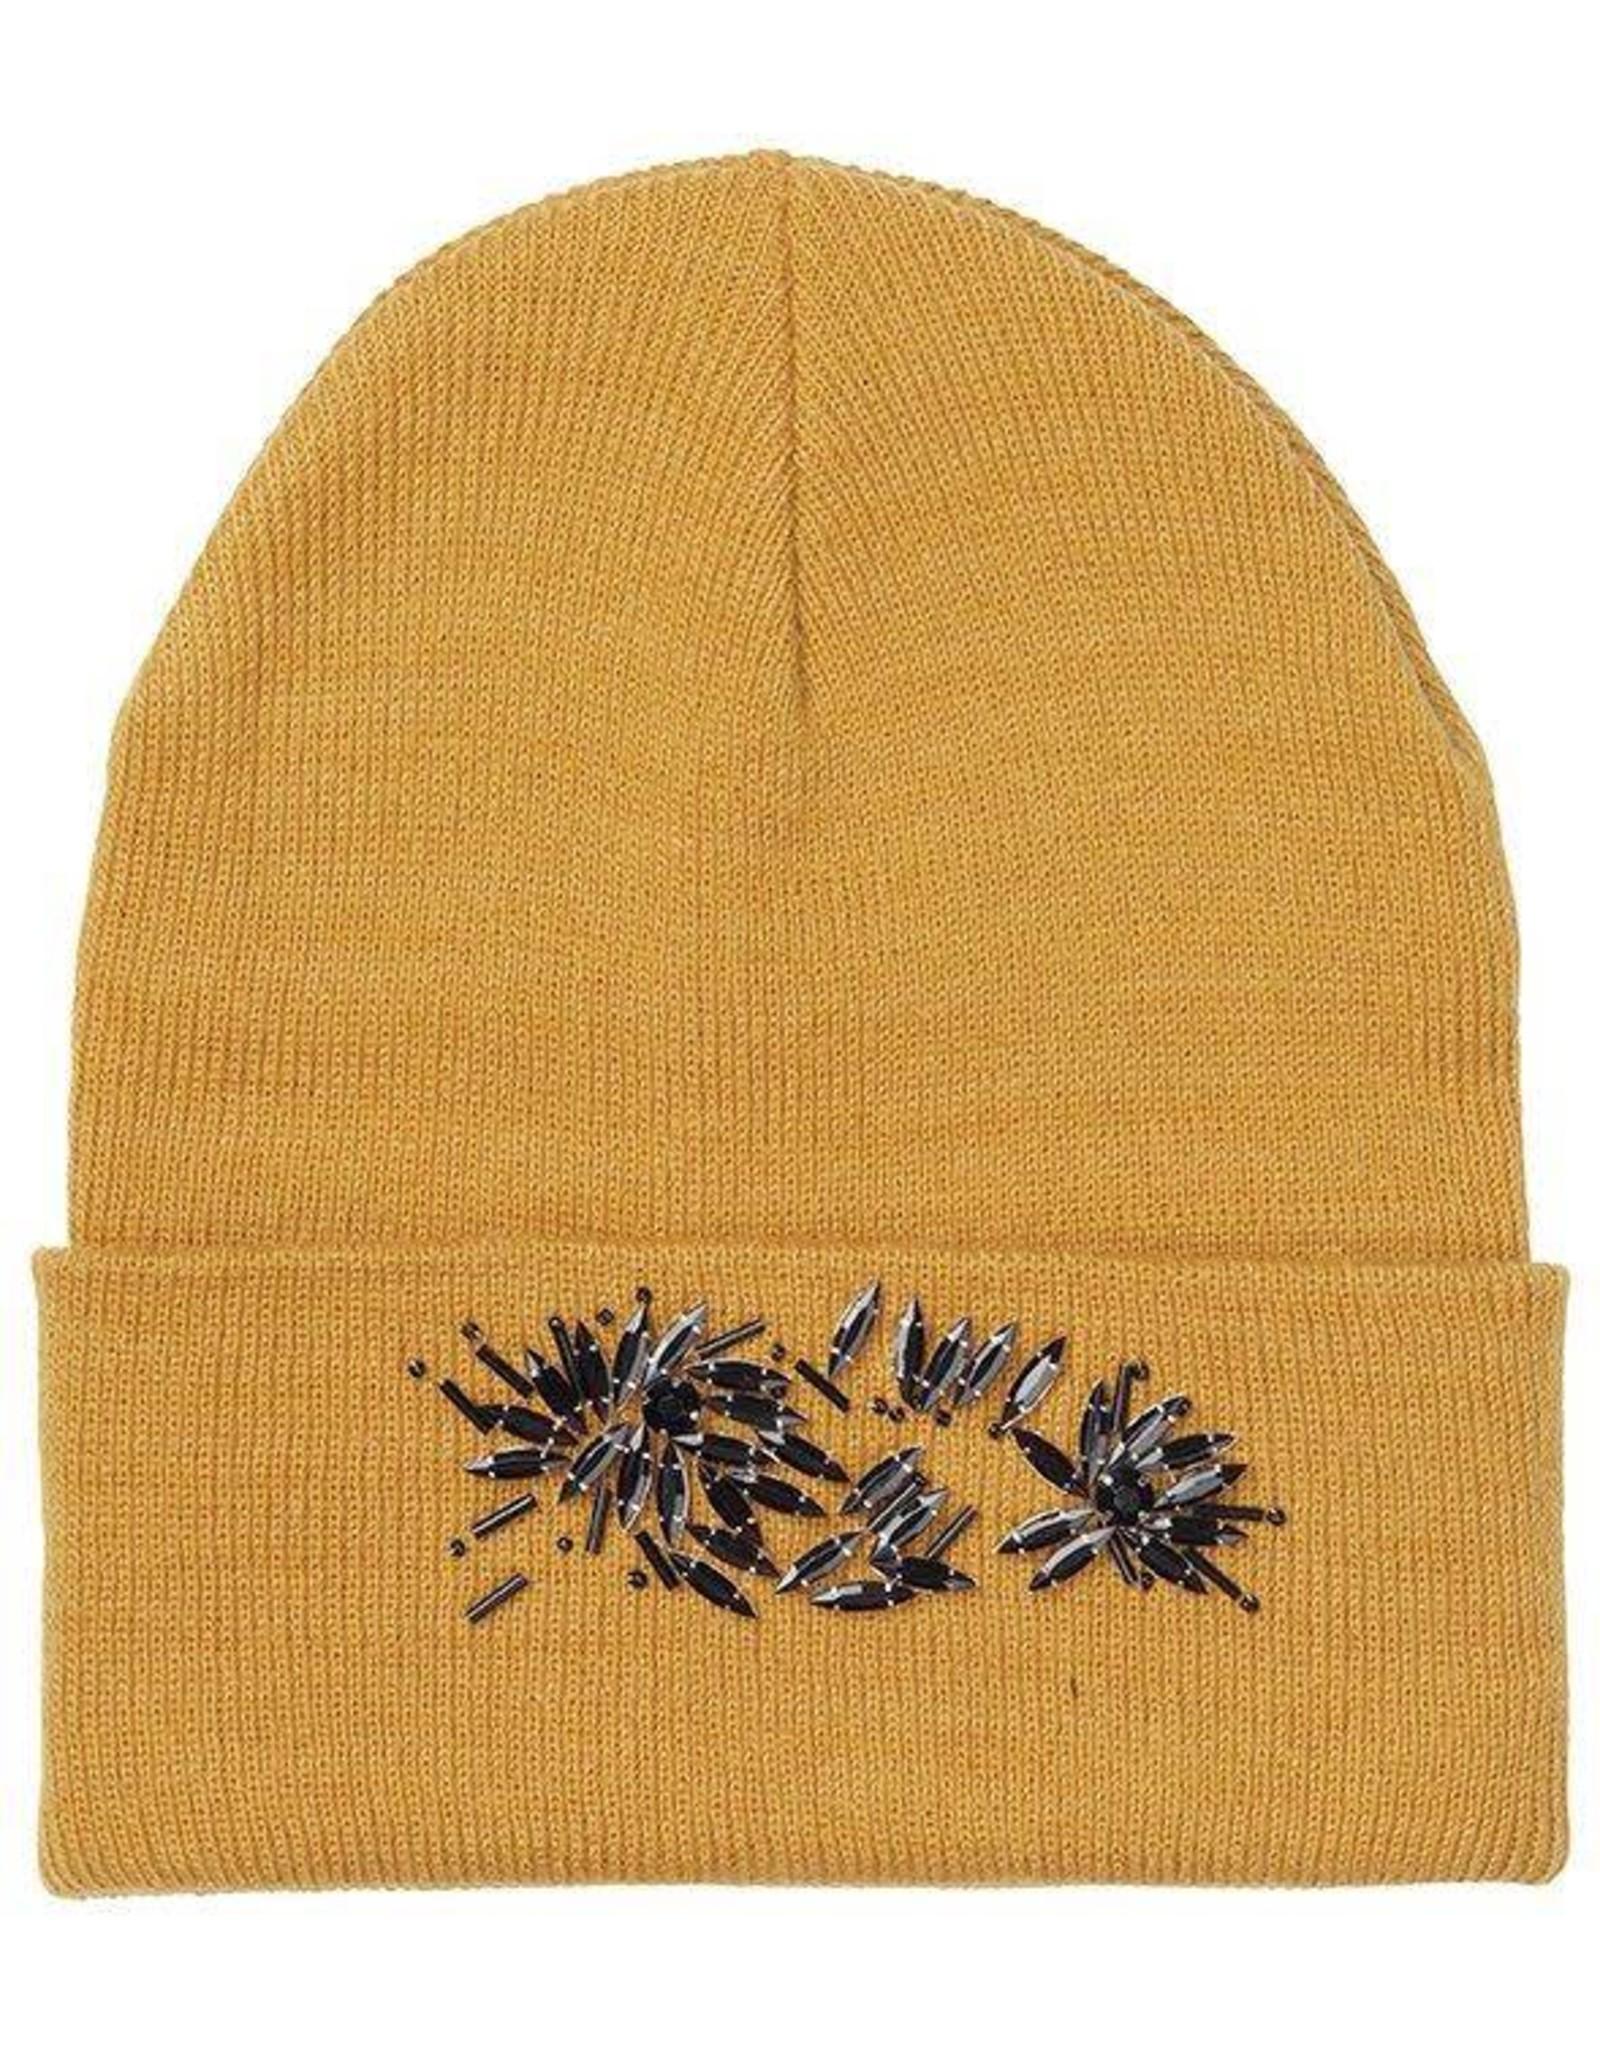 Unmade Igeme Hat Gold